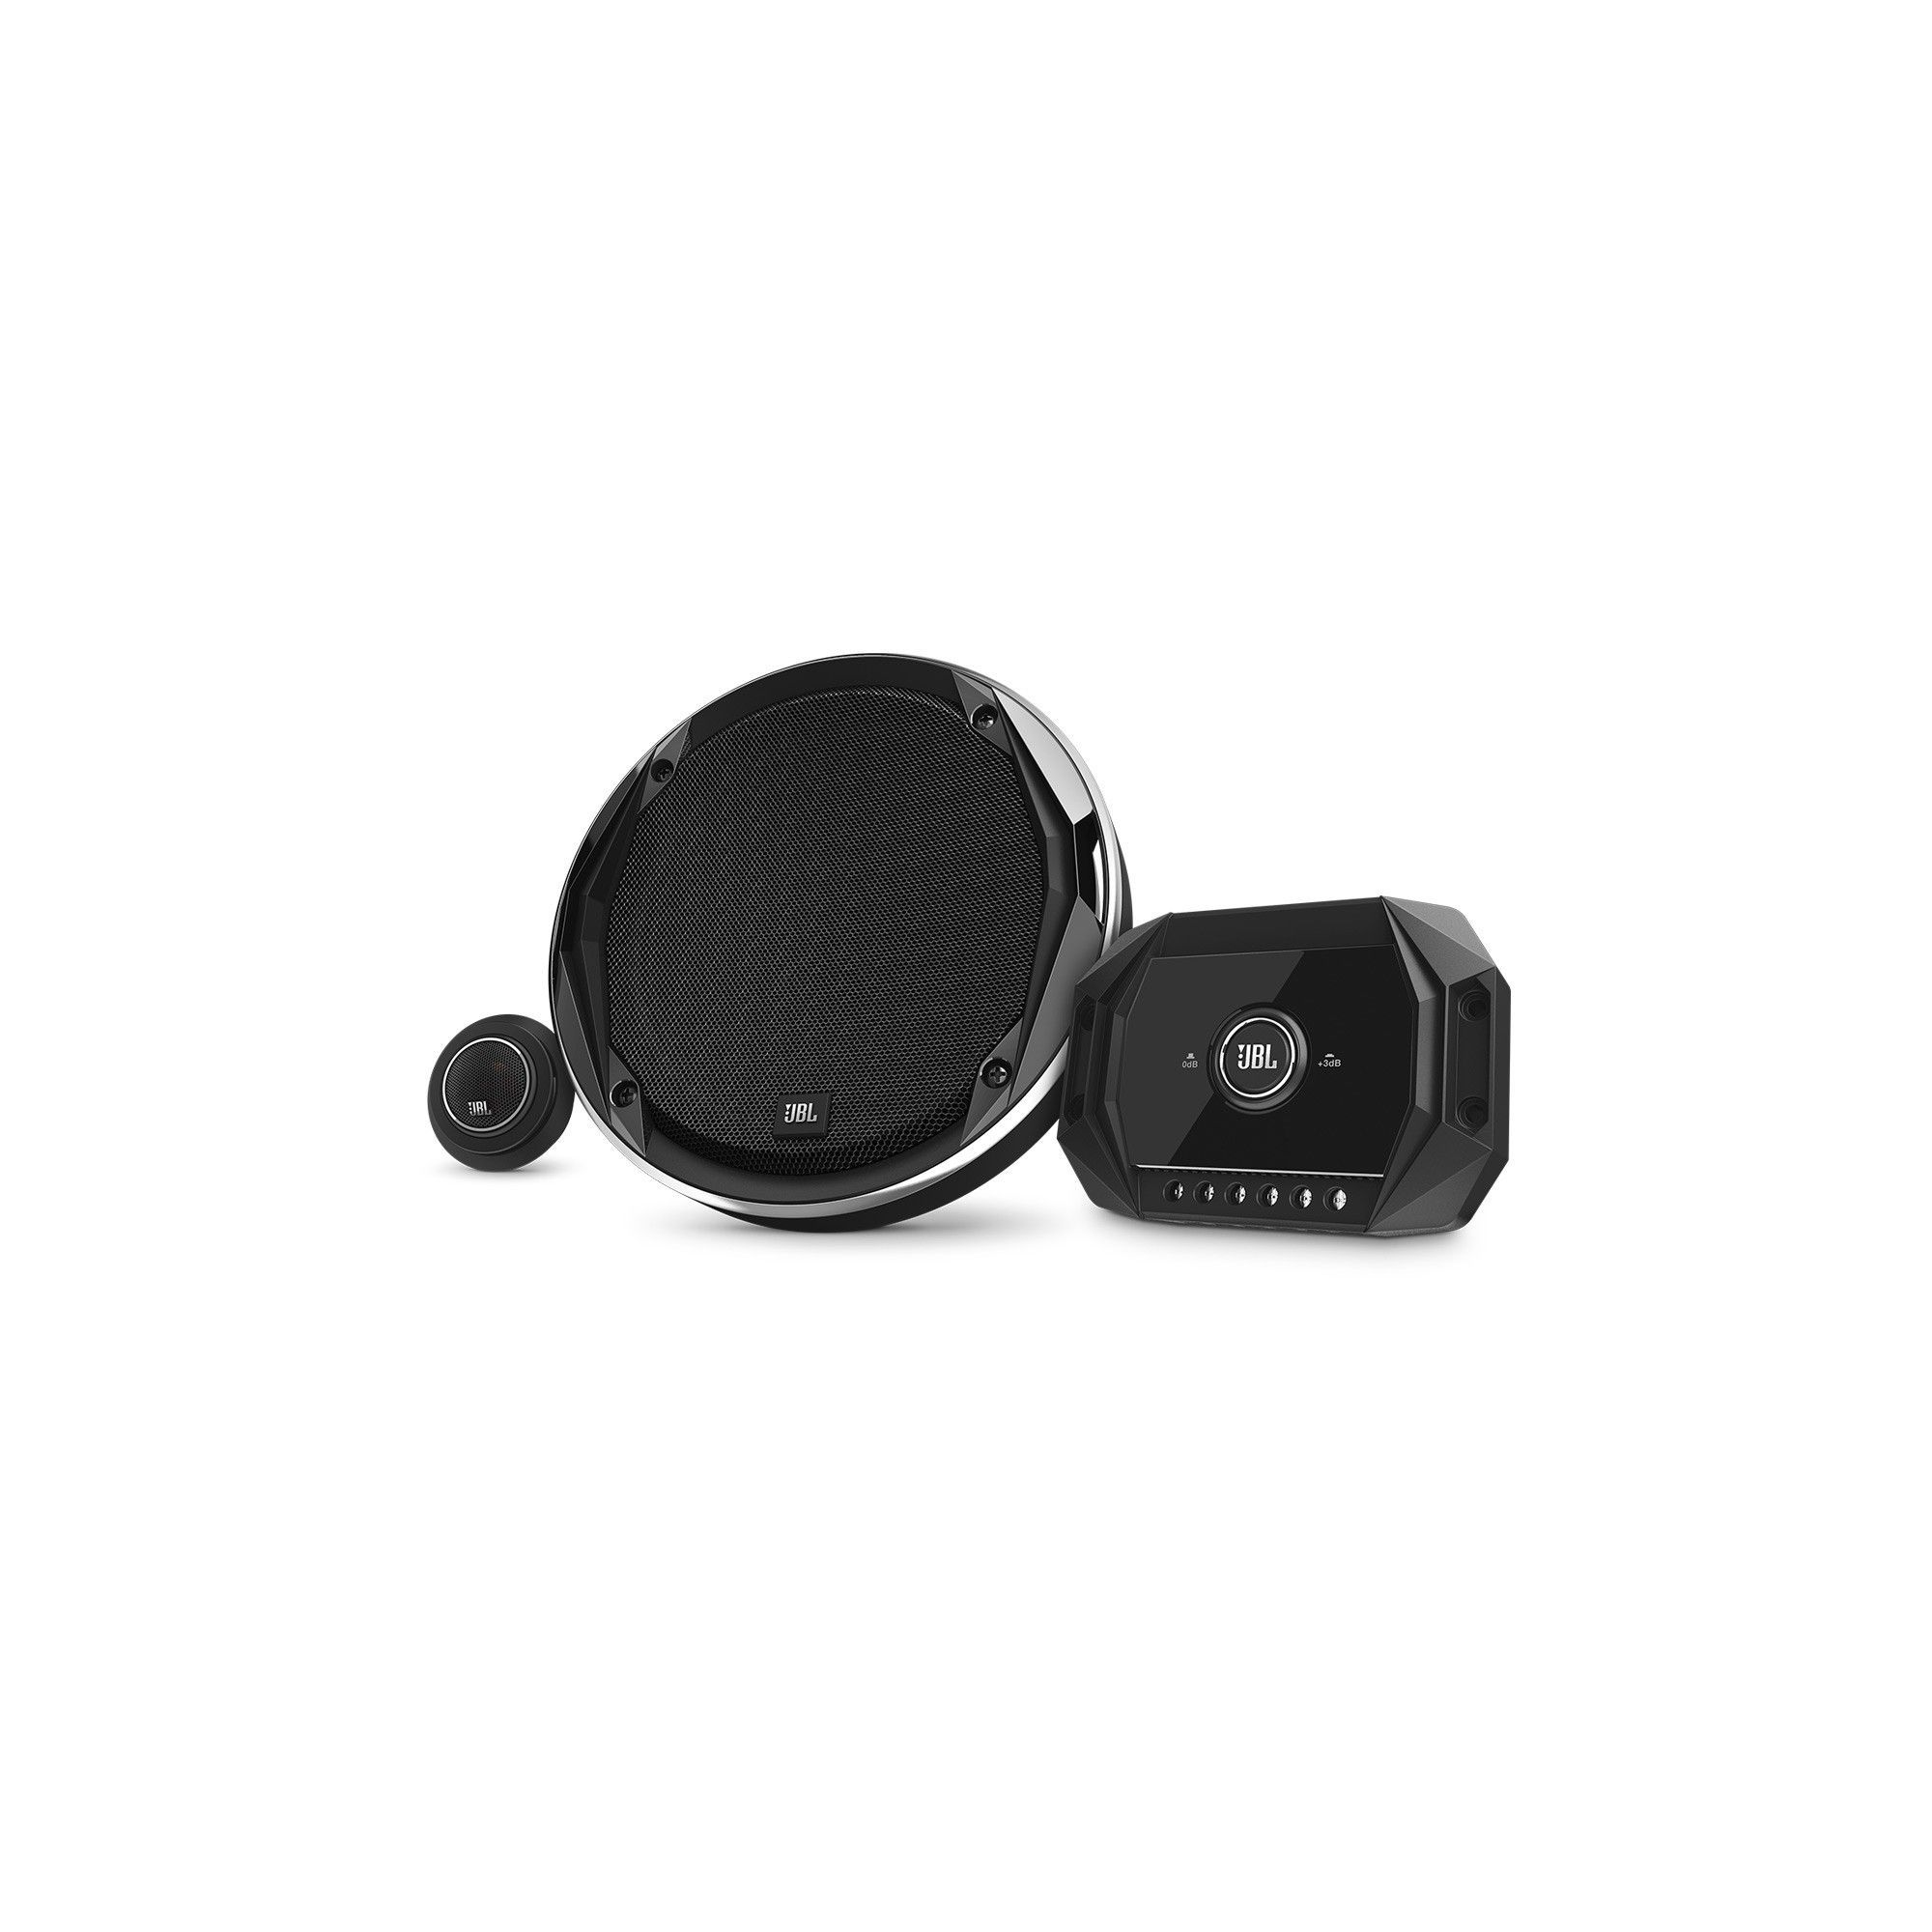 JBL Stadium GTO 600C 6-1/2 2-Way Stadium Component Speakers, Black #componentspeakers JBL Stadium GTO 600C 6-1/2 2-Way Stadium Component Speakers, Black #componentspeakers